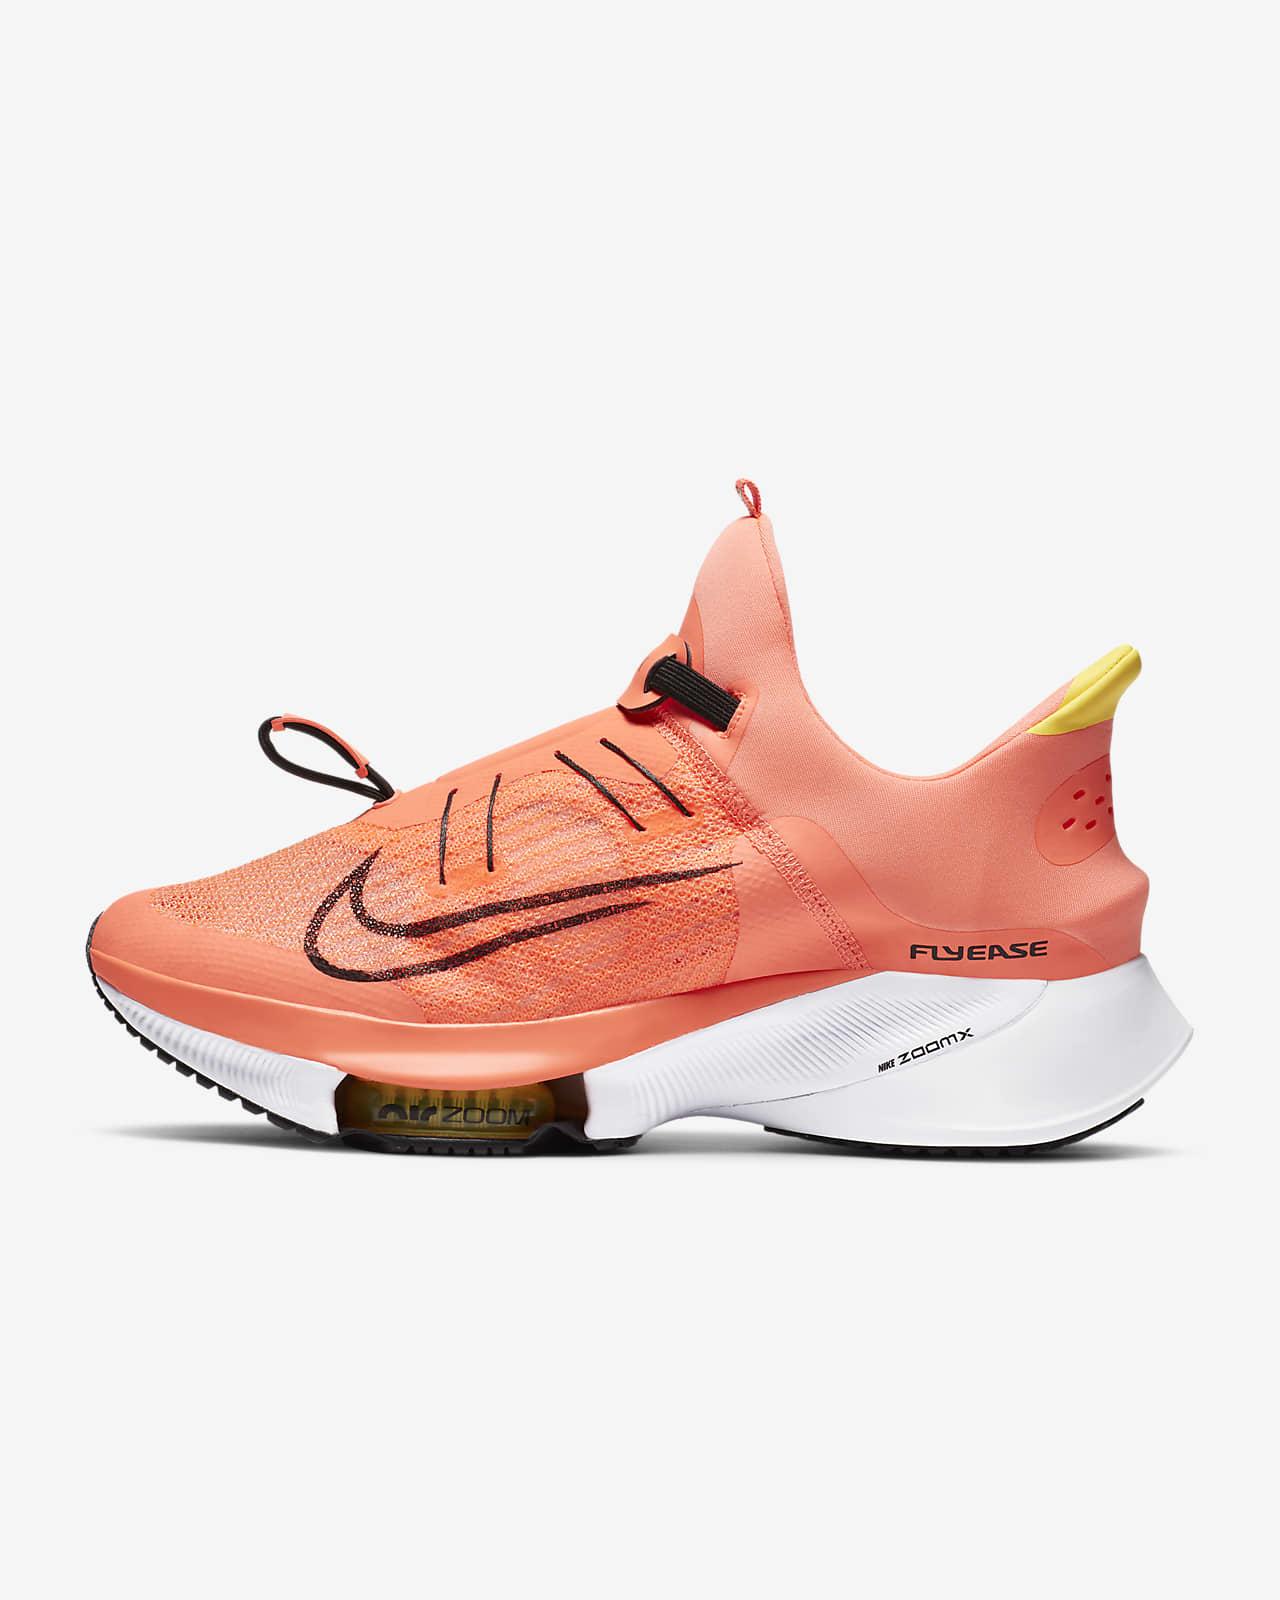 Nike Air Zoom Tempo Next% FlyEase Herren-Laufschuh